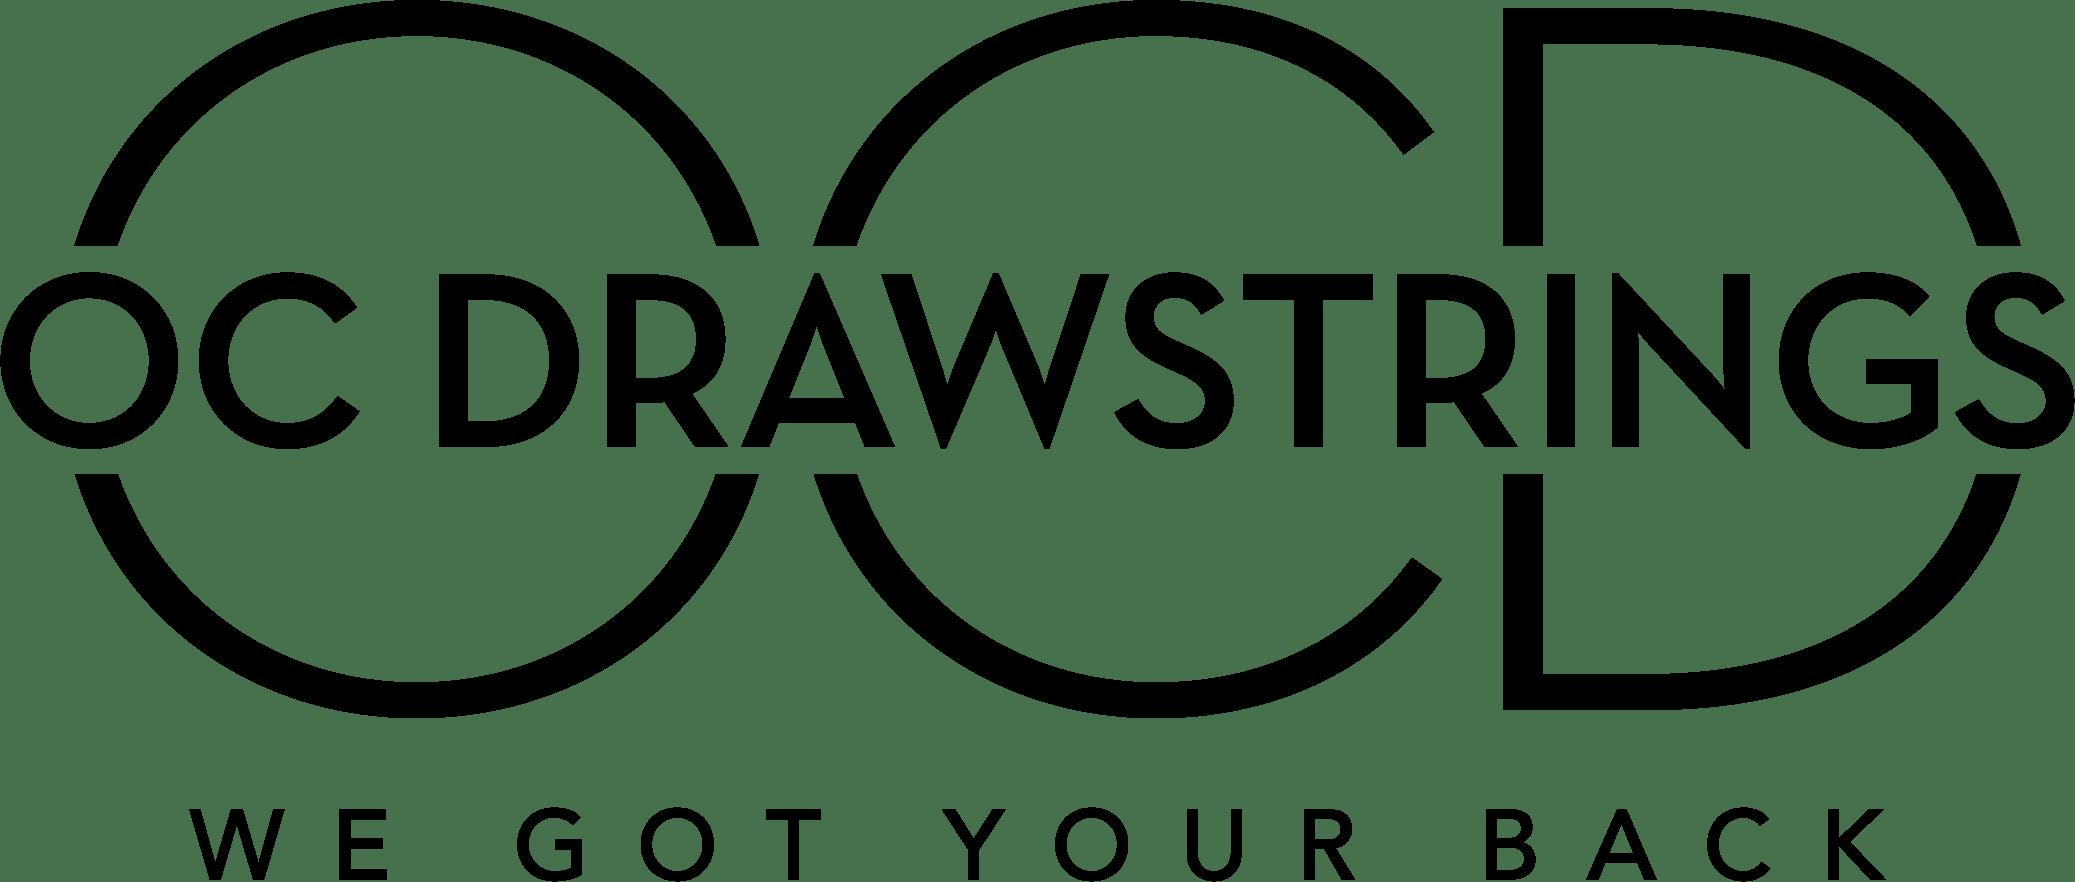 OC Drawstrings